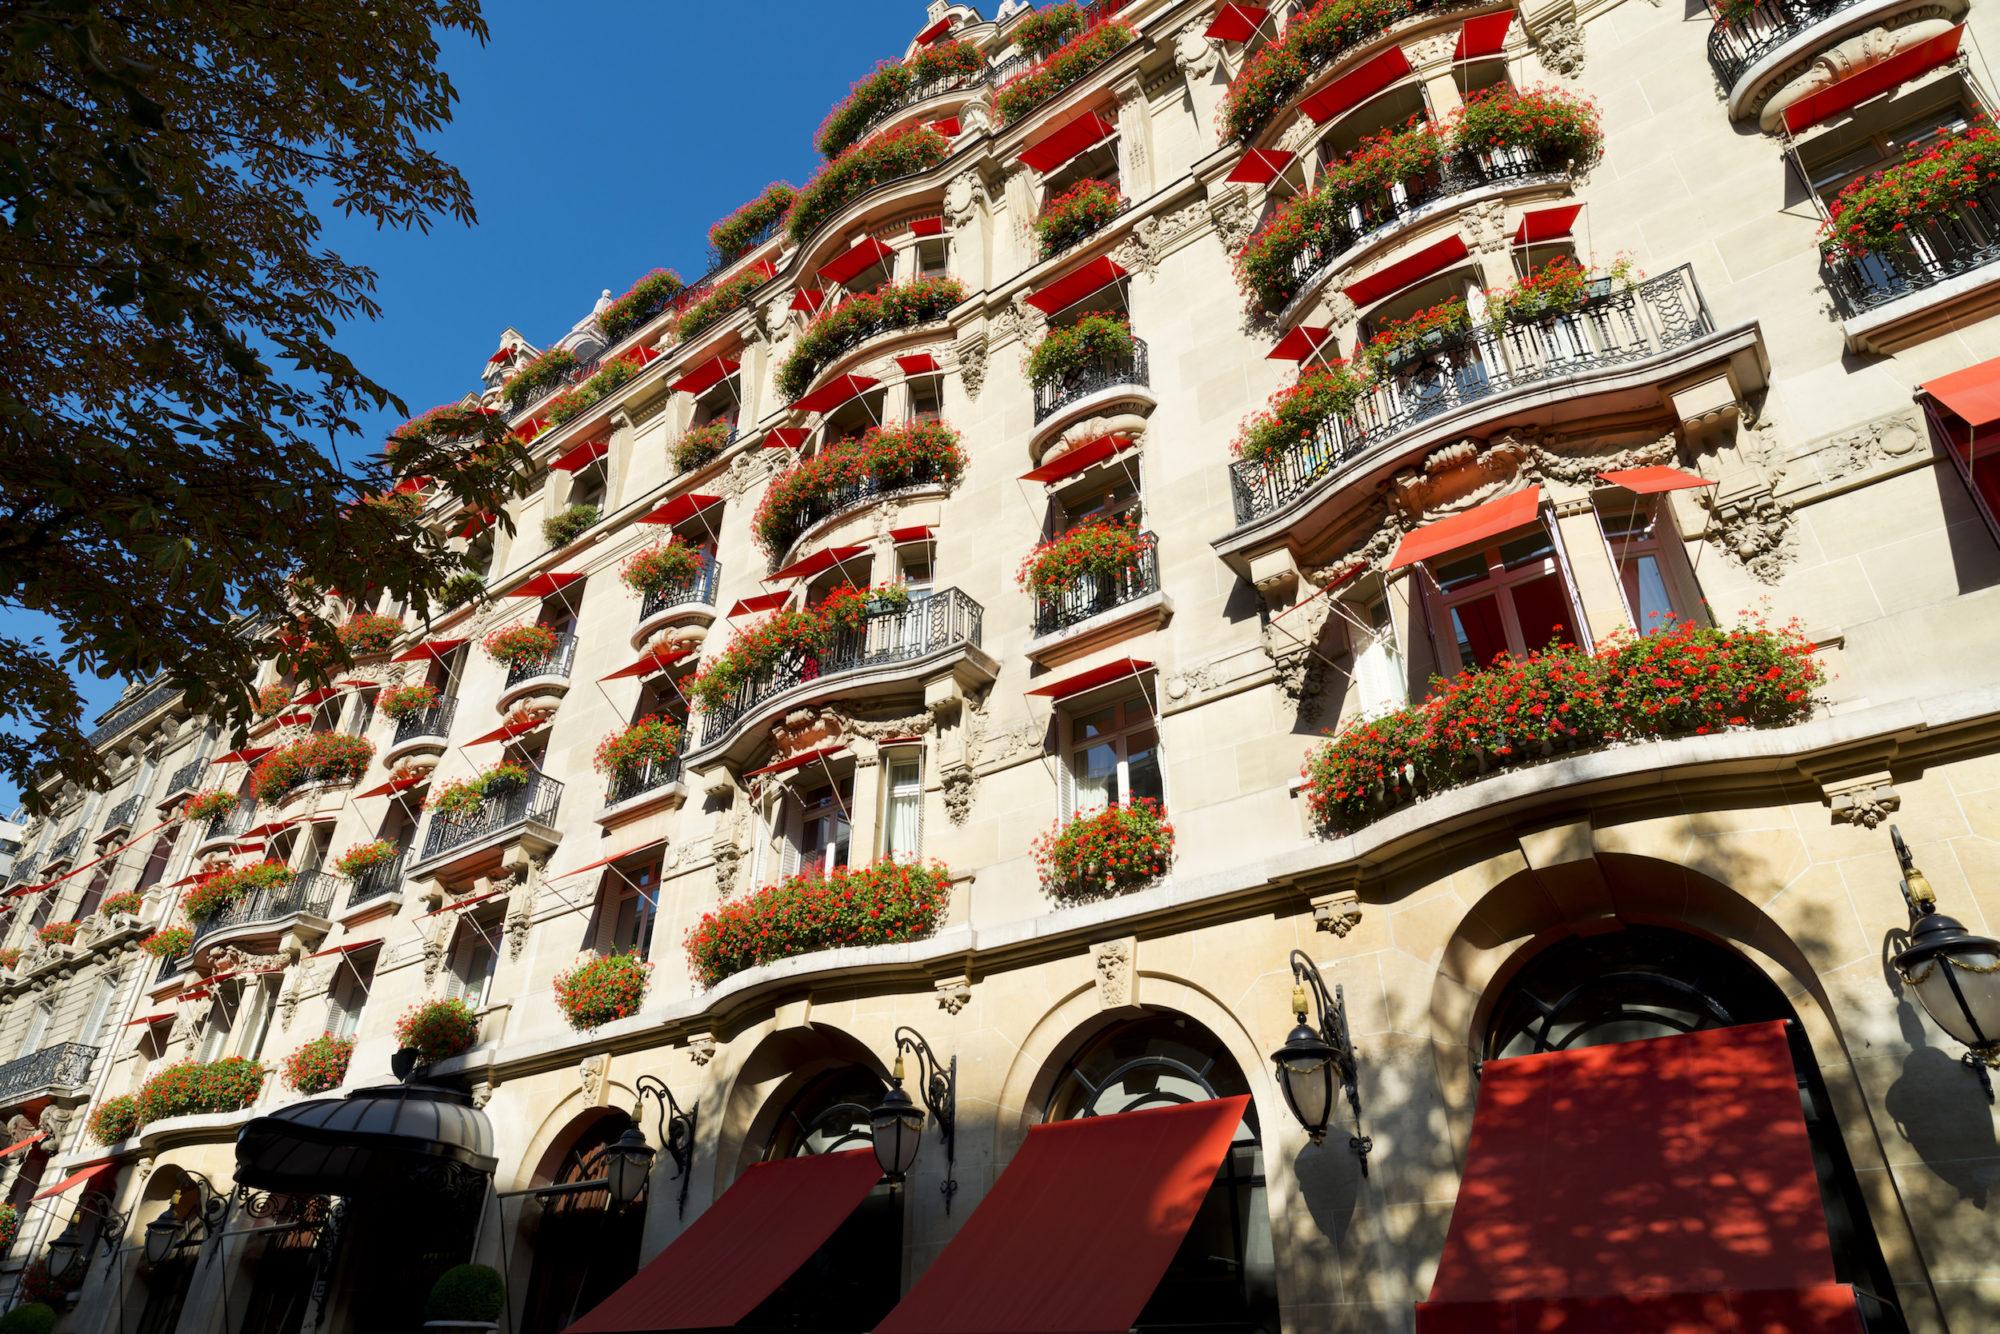 Hôtel Plaza Athénée Paris(ホテル プラザアテネ)外観